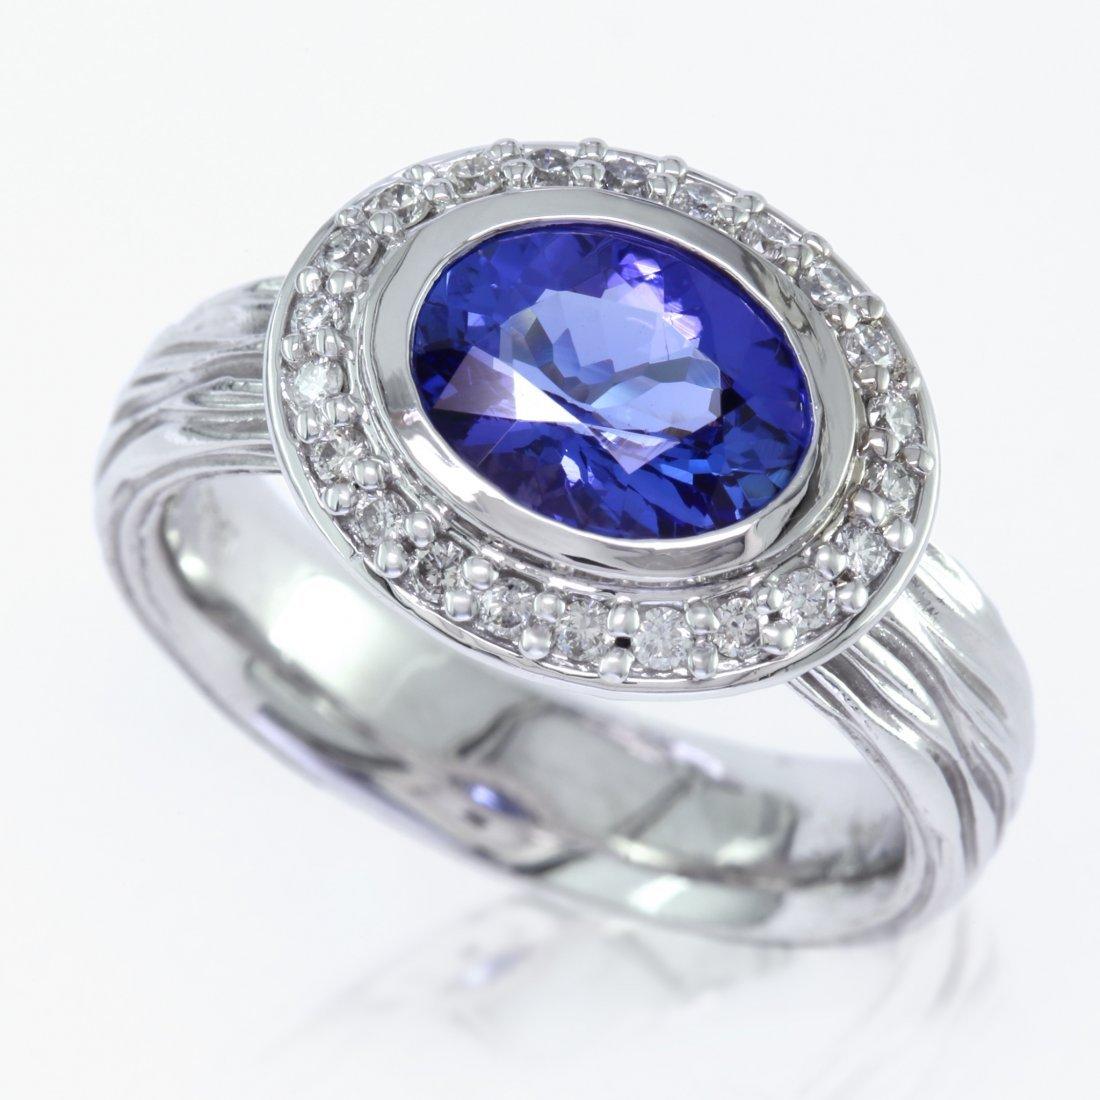 White Gold And Tanzanite Ring